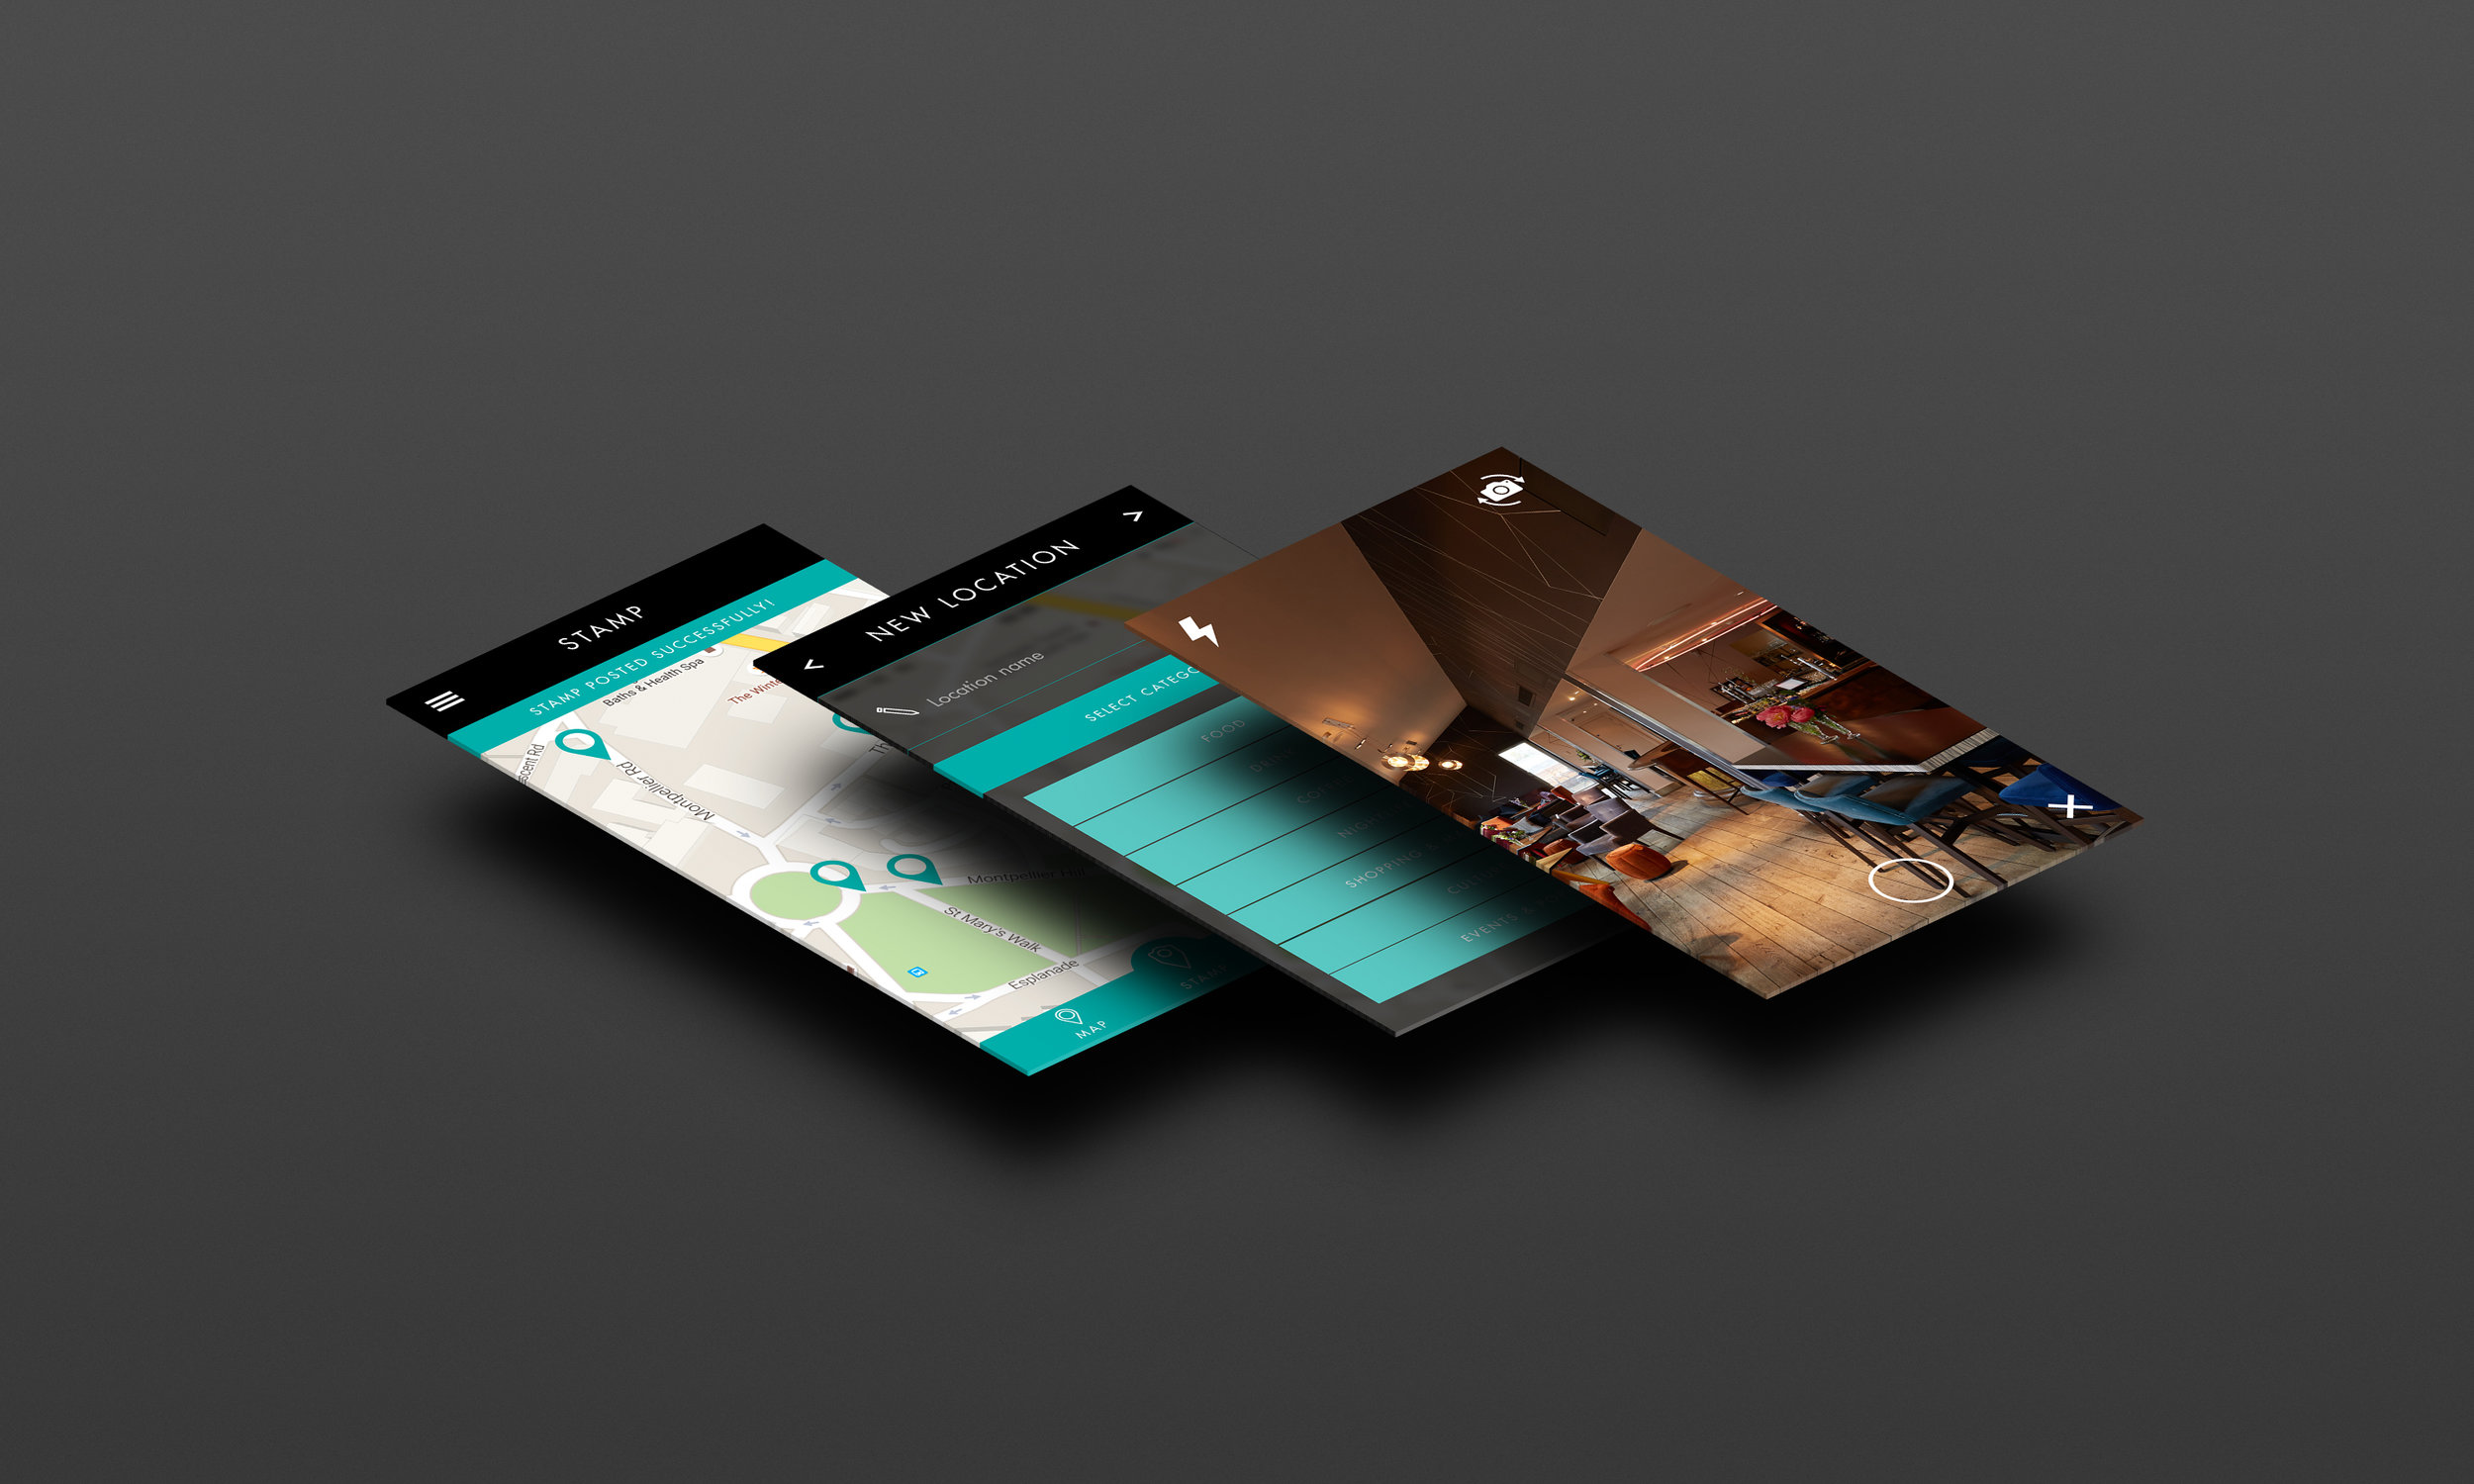 SmartPhone-Screens-presentation-Mock-up.jpg